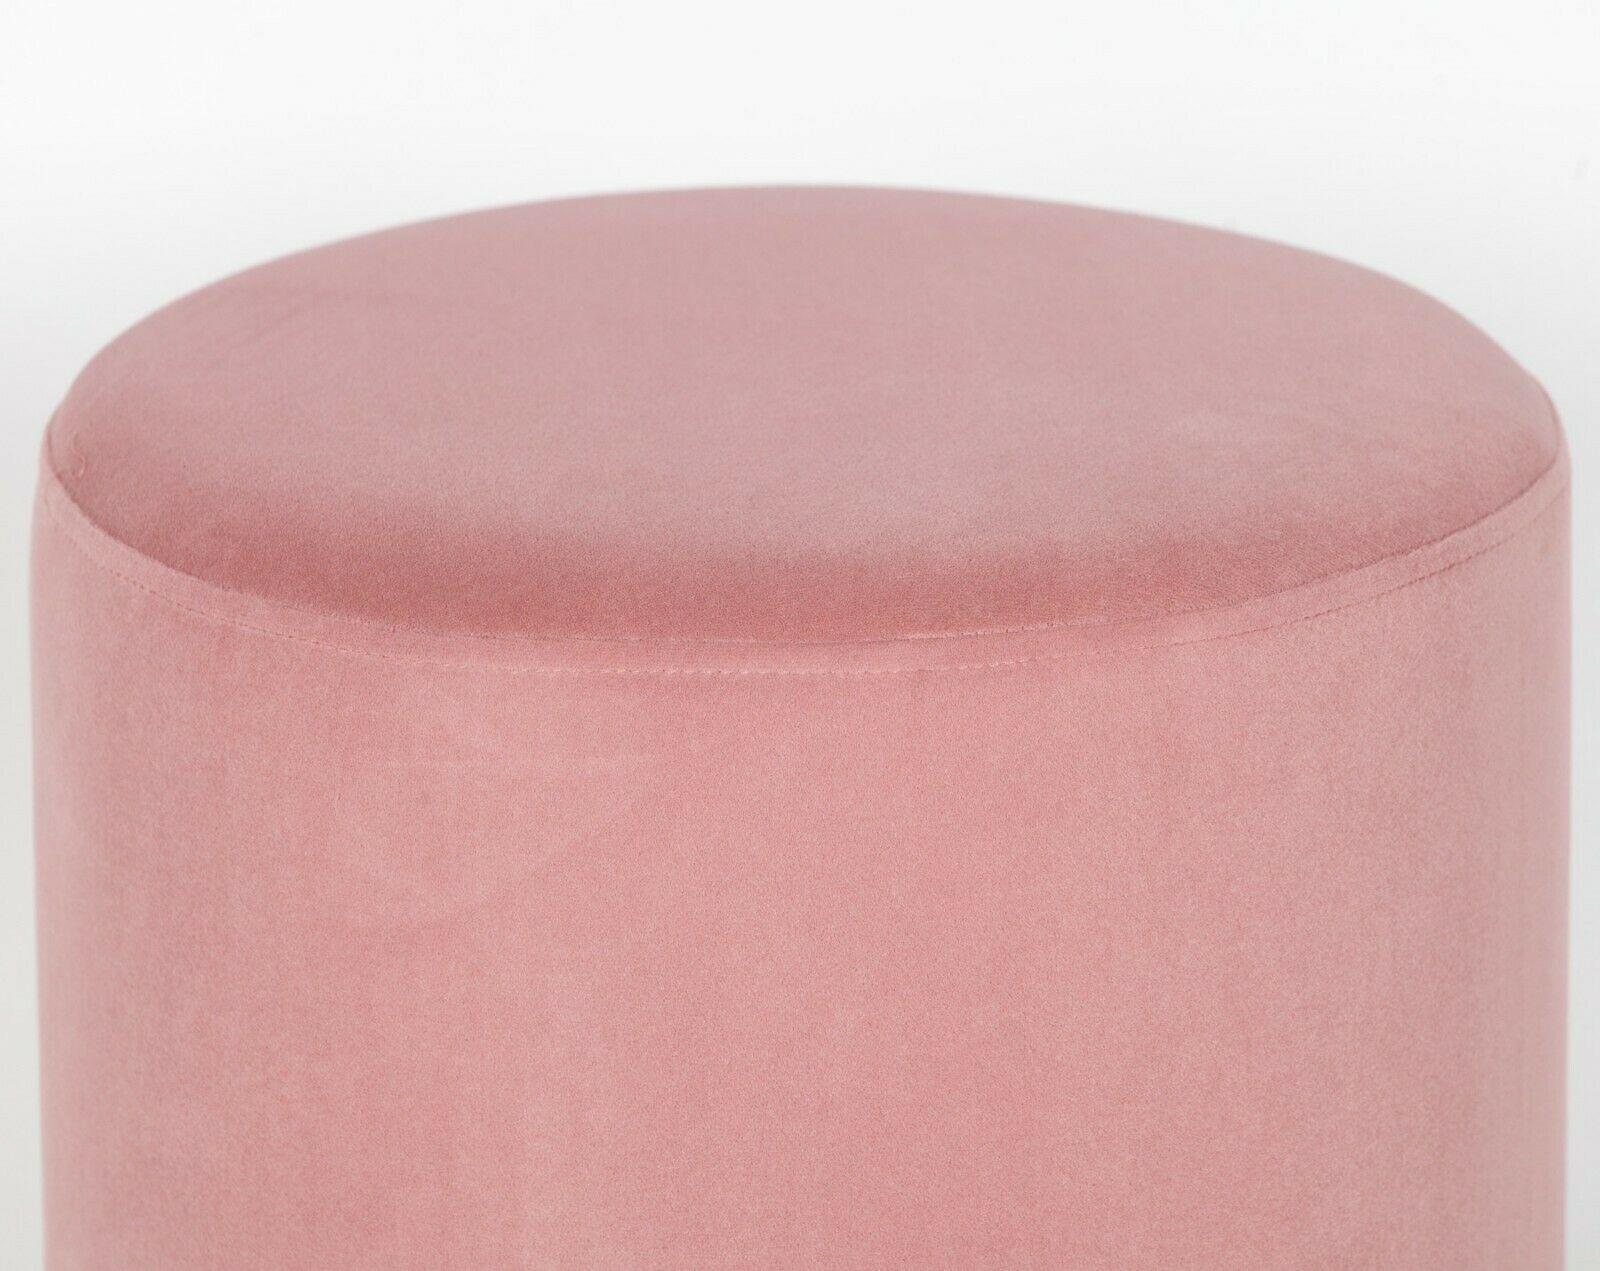 Amour Pink Velvet Gold Trim Round Pouffe Upholstered Stool